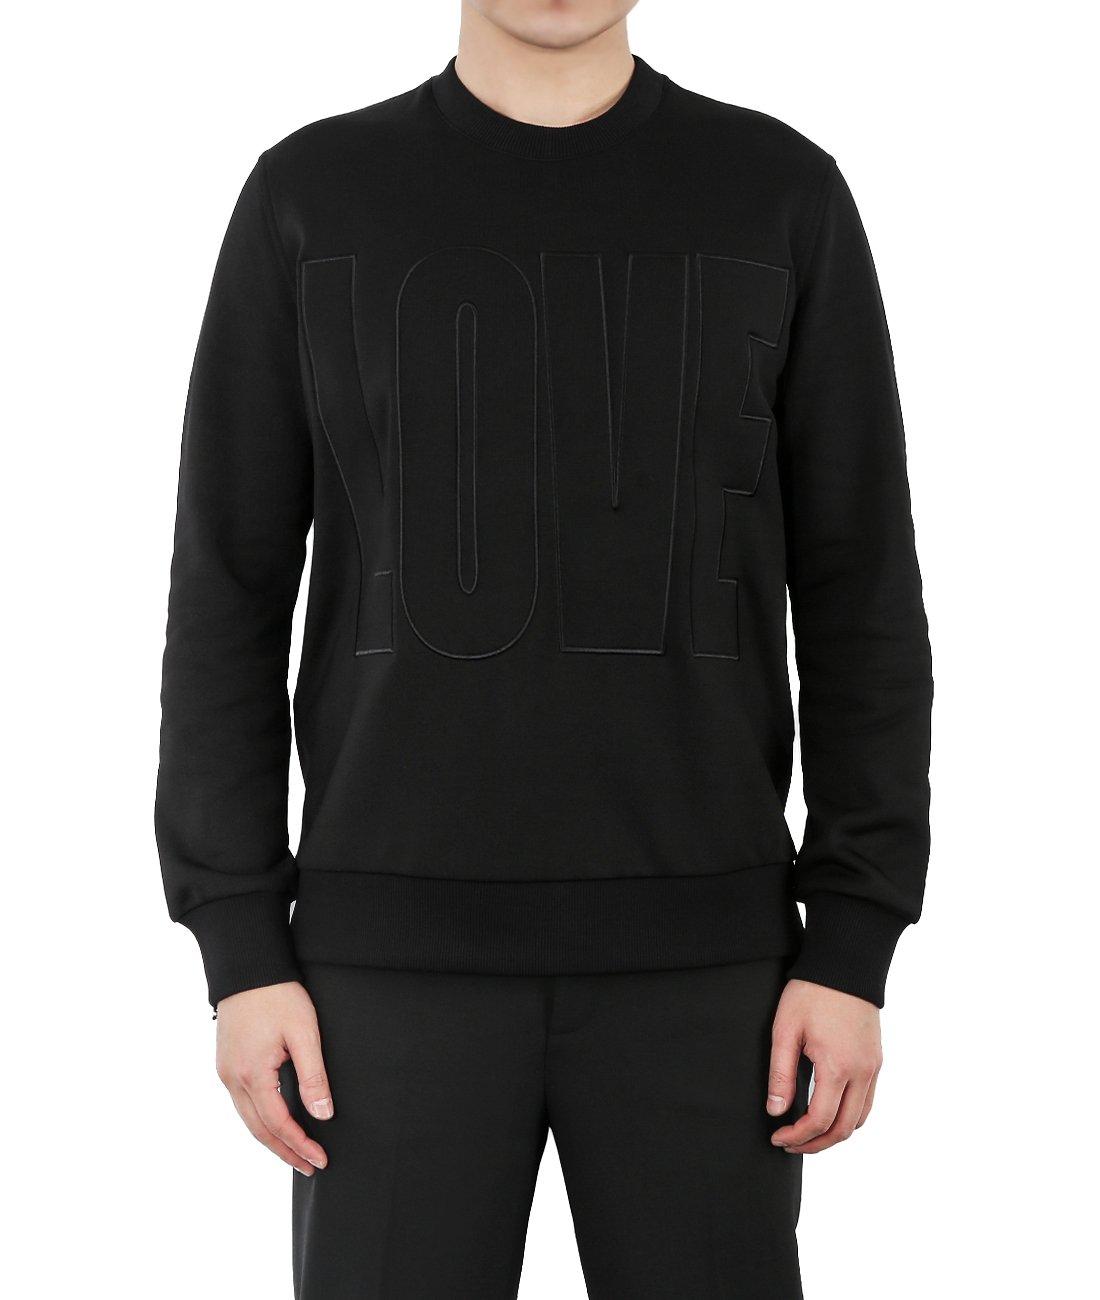 Wiberlux Givenchy Men's Love Sweatshirt M Black